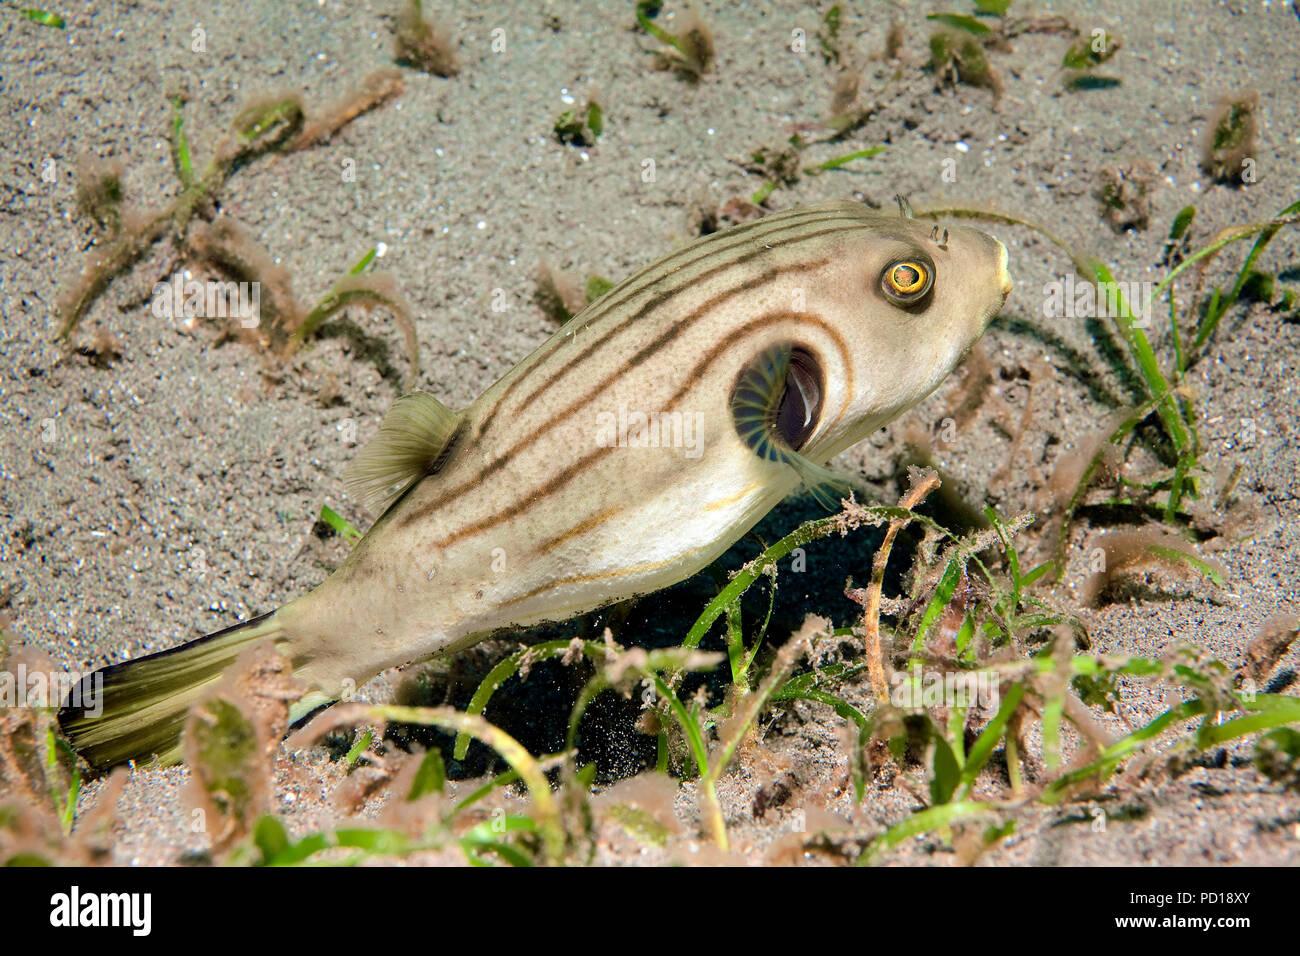 Manila-Kugelfisch (Arothron manilensis), Dumaguete, Negros, Philippinen | Manila puffer (Arothron manilensis), Dumaguete, Negros, Philippines Stock Photo